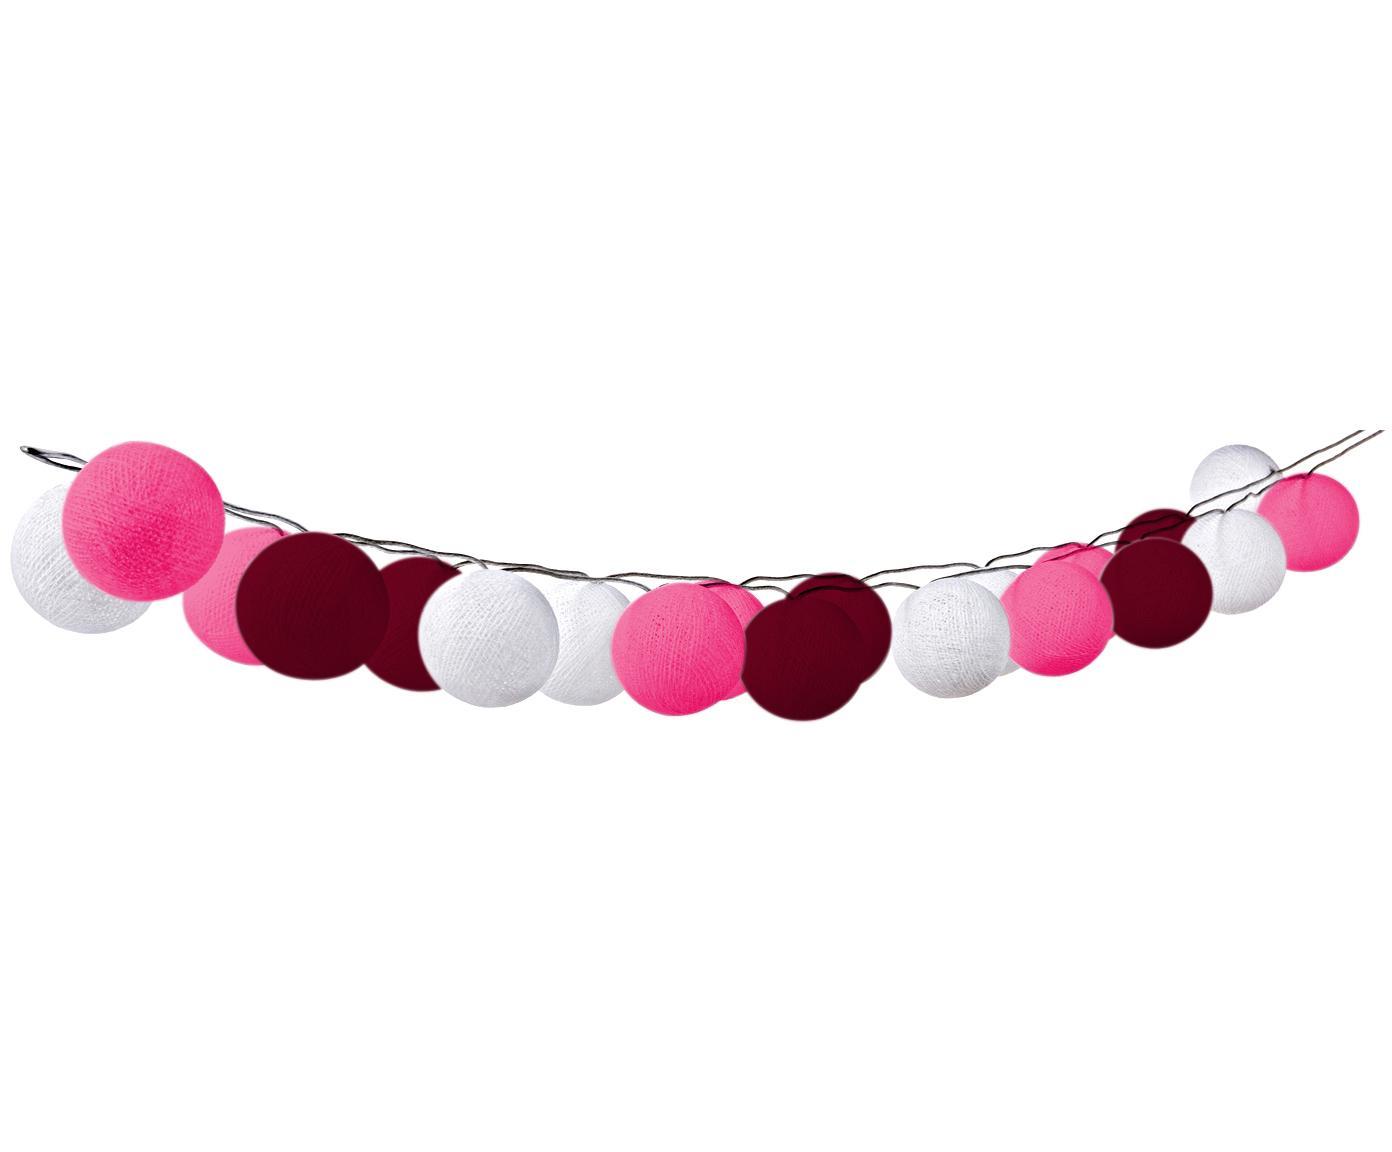 Ghirlanda  a LED Bellin, 320 cm, Lanterne: cotone, Rosa, rosso scuro, bianco, Lung. 320 cm